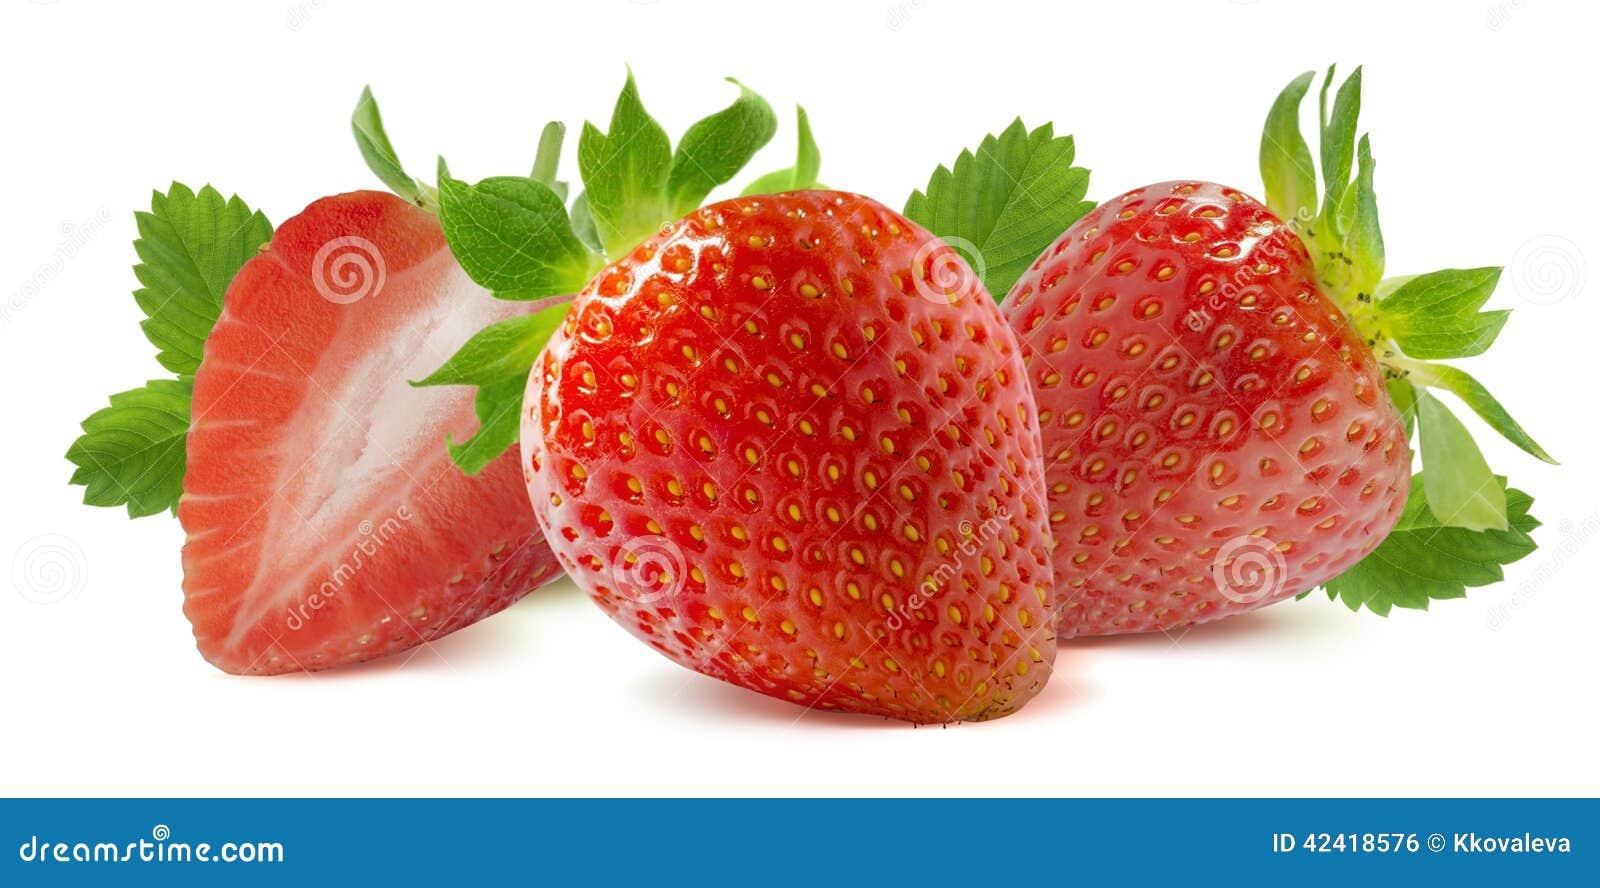 Horizontal strawberry composition isolated on white background